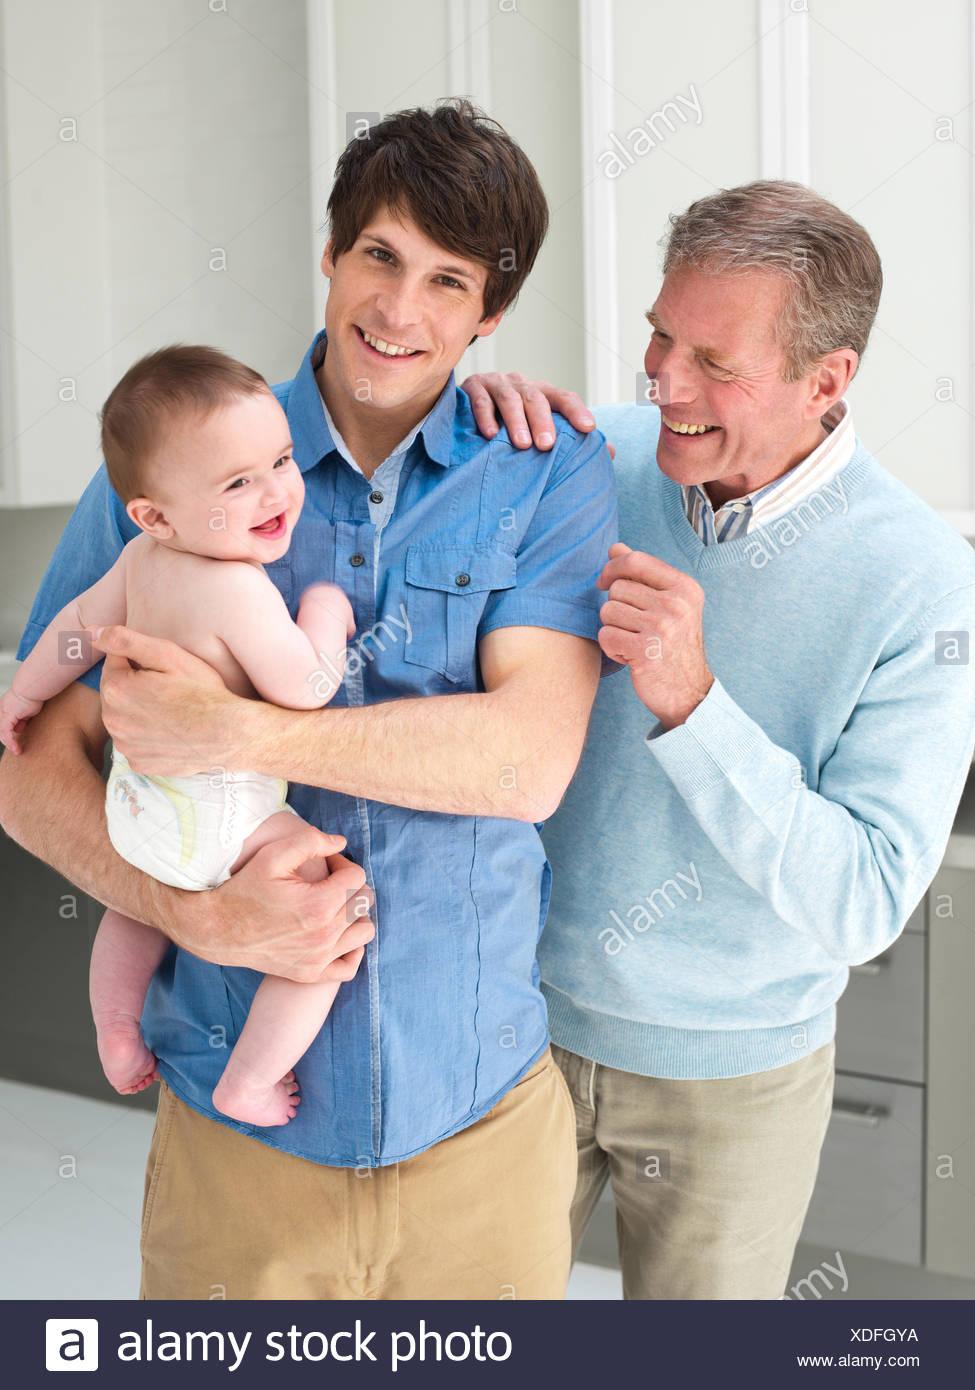 Lächelnde generationsübergreifende Männchen Stockbild